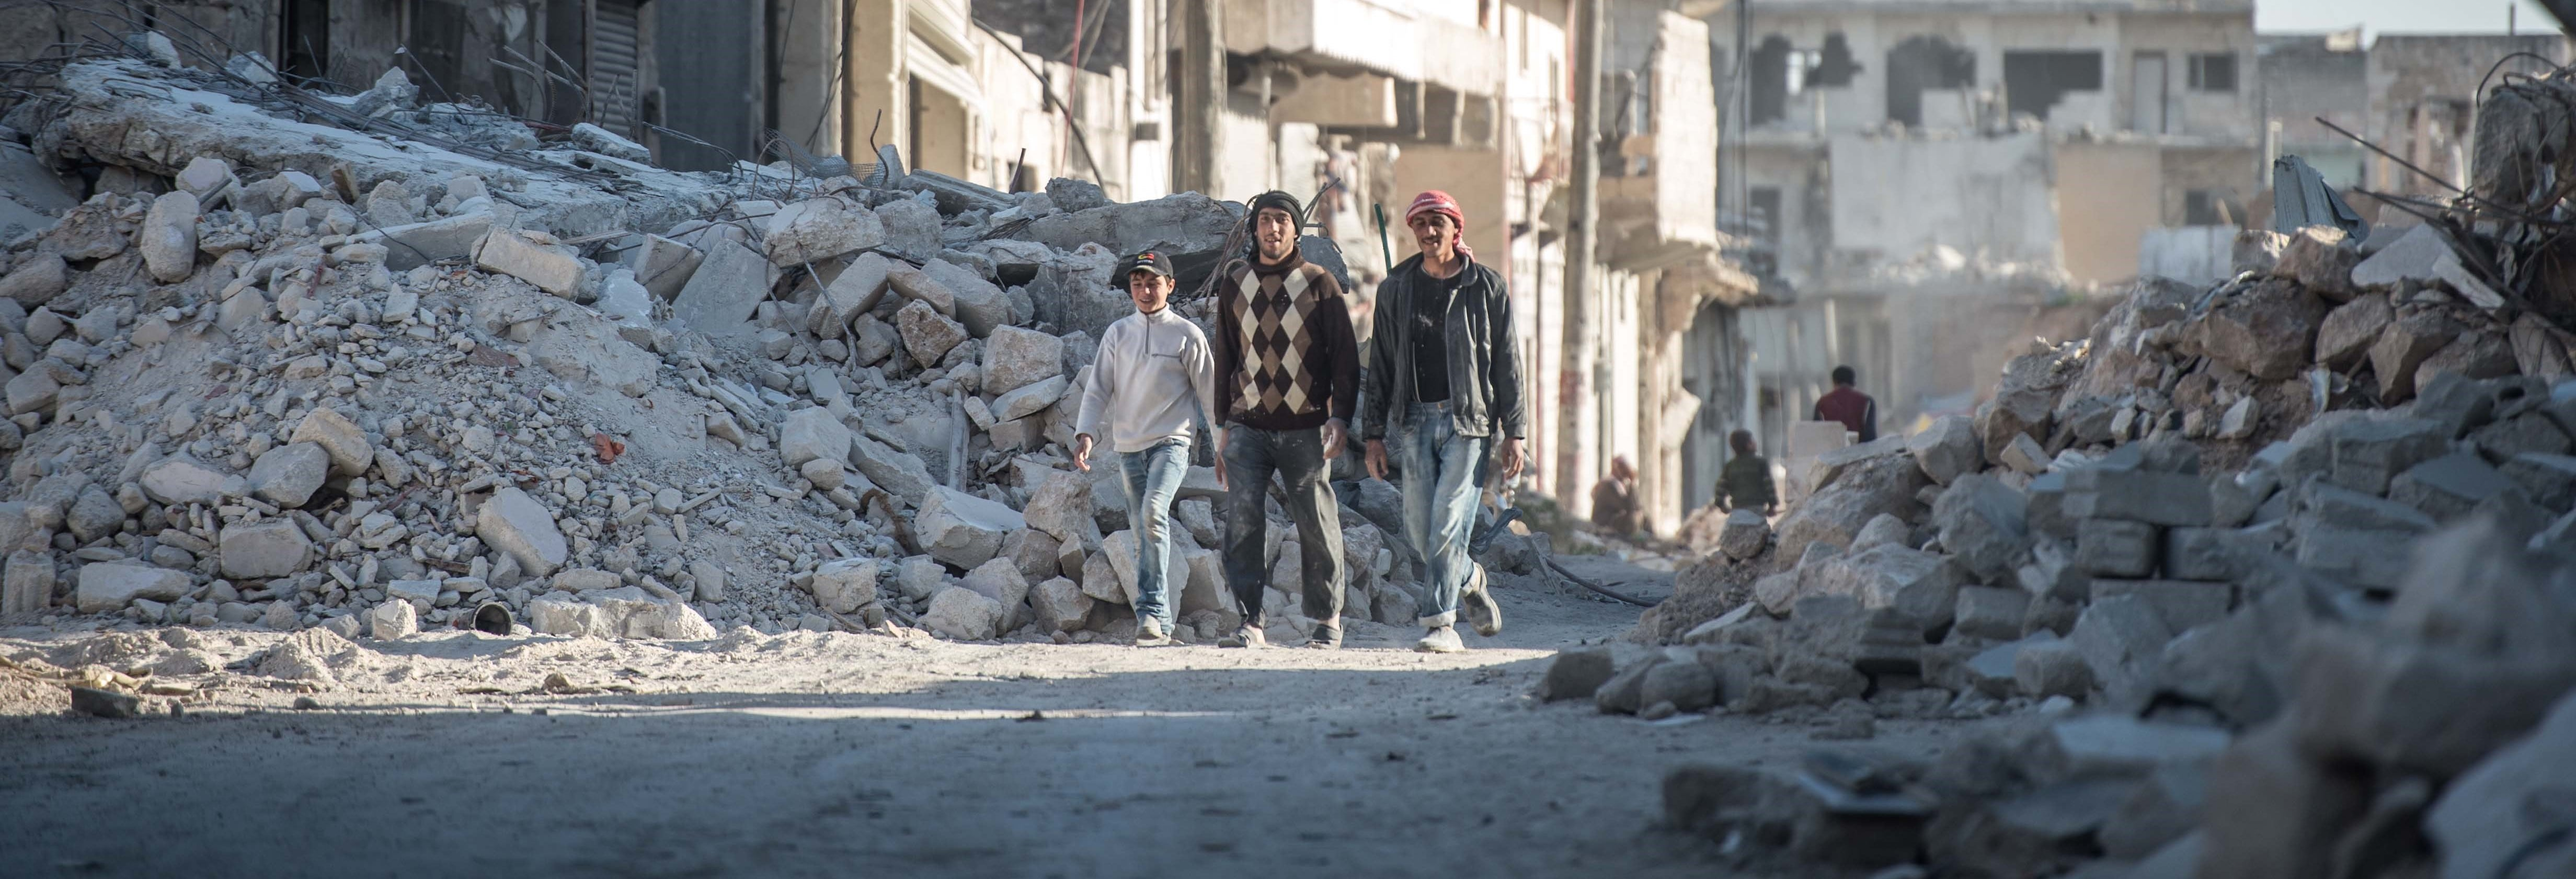 Syrians walk past damaged houses in Al-Bab district of Aleppo, Syria (Photo: Kerem Kocalar/Anadolu Agency/Getty Images)